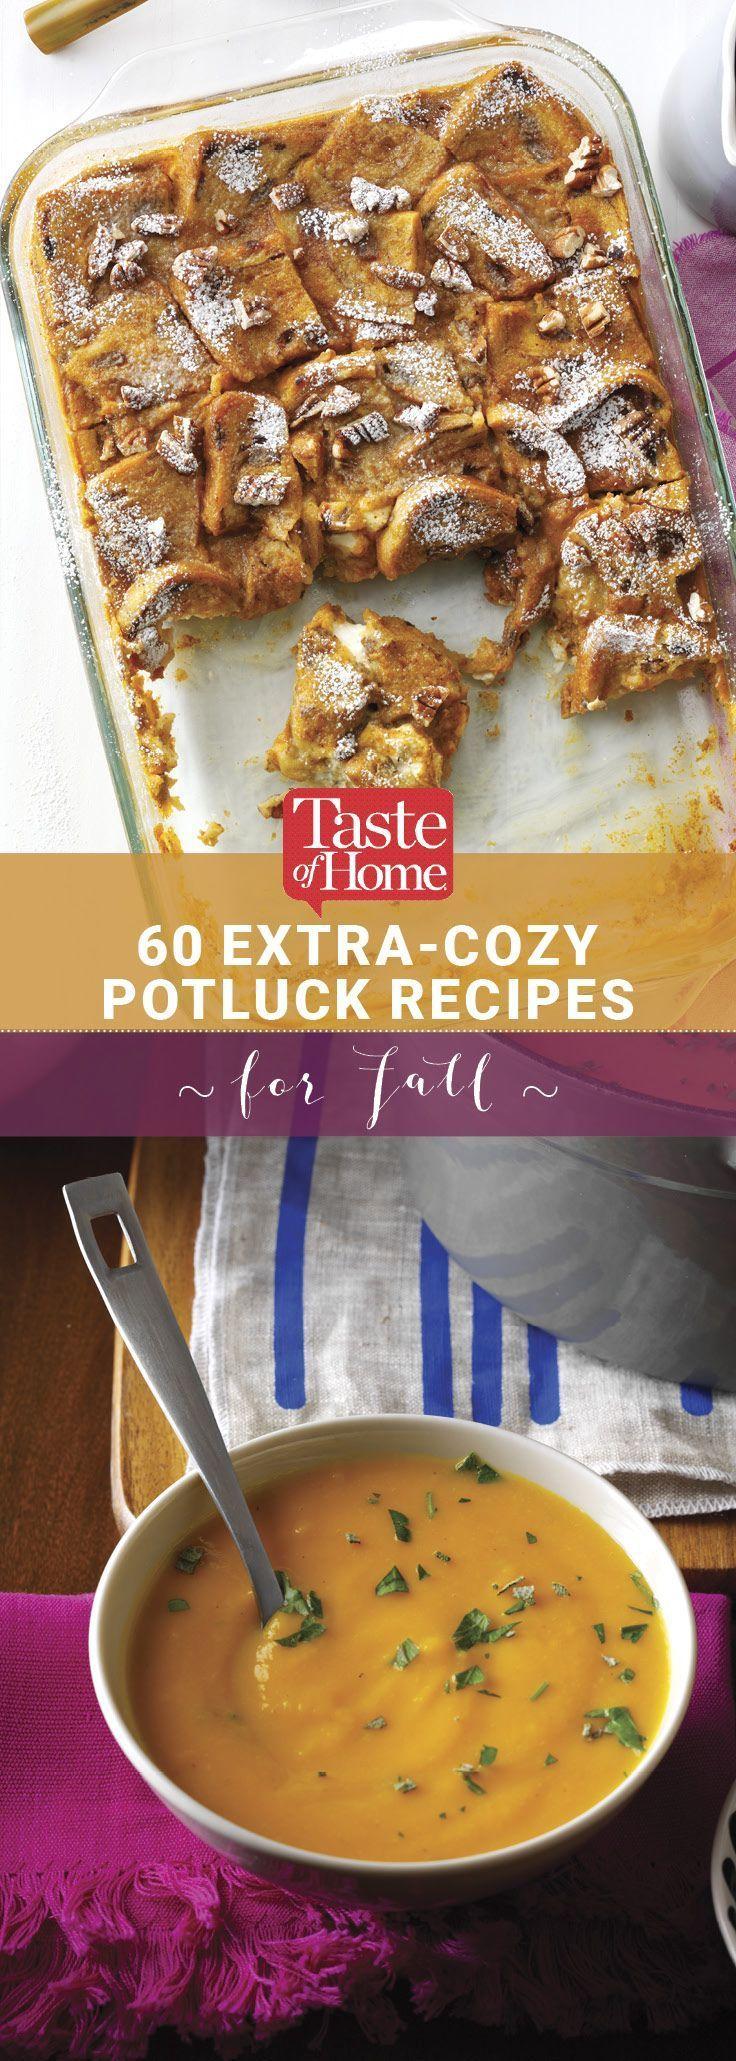 75 Fall Potluck Ideas That'll Make You Feel Positively Cozy #halloweenpotluckideas 60 Extra-Cozy Potluck Recipes for Fall from Taste of Home #halloweenpotluckideas